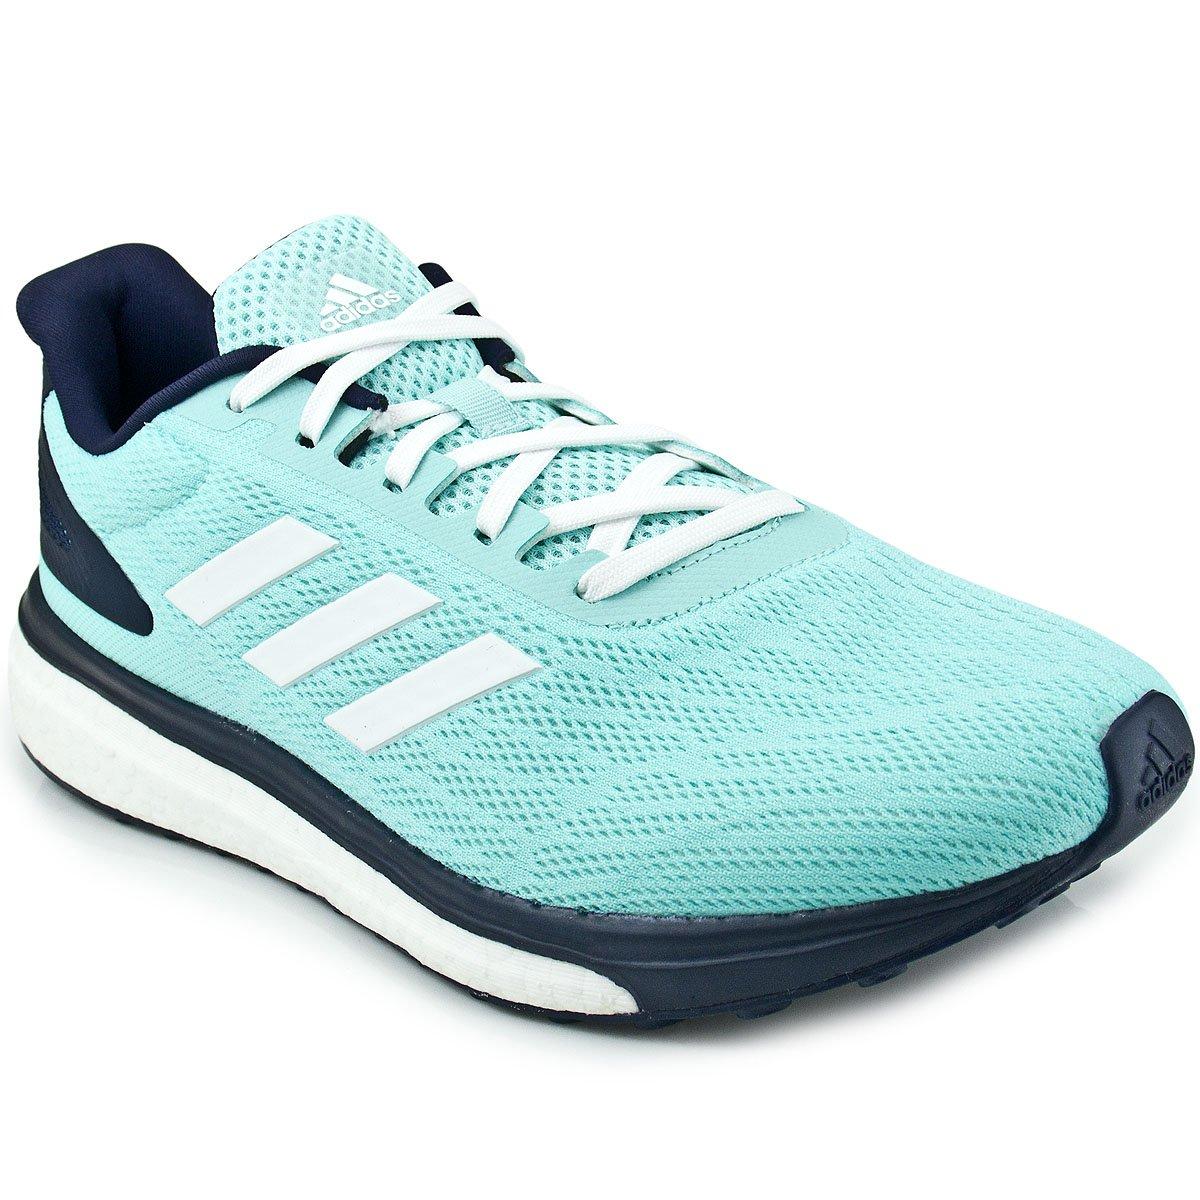 Tênis Adidas Response Boost LT W  5b0d1edbef6df